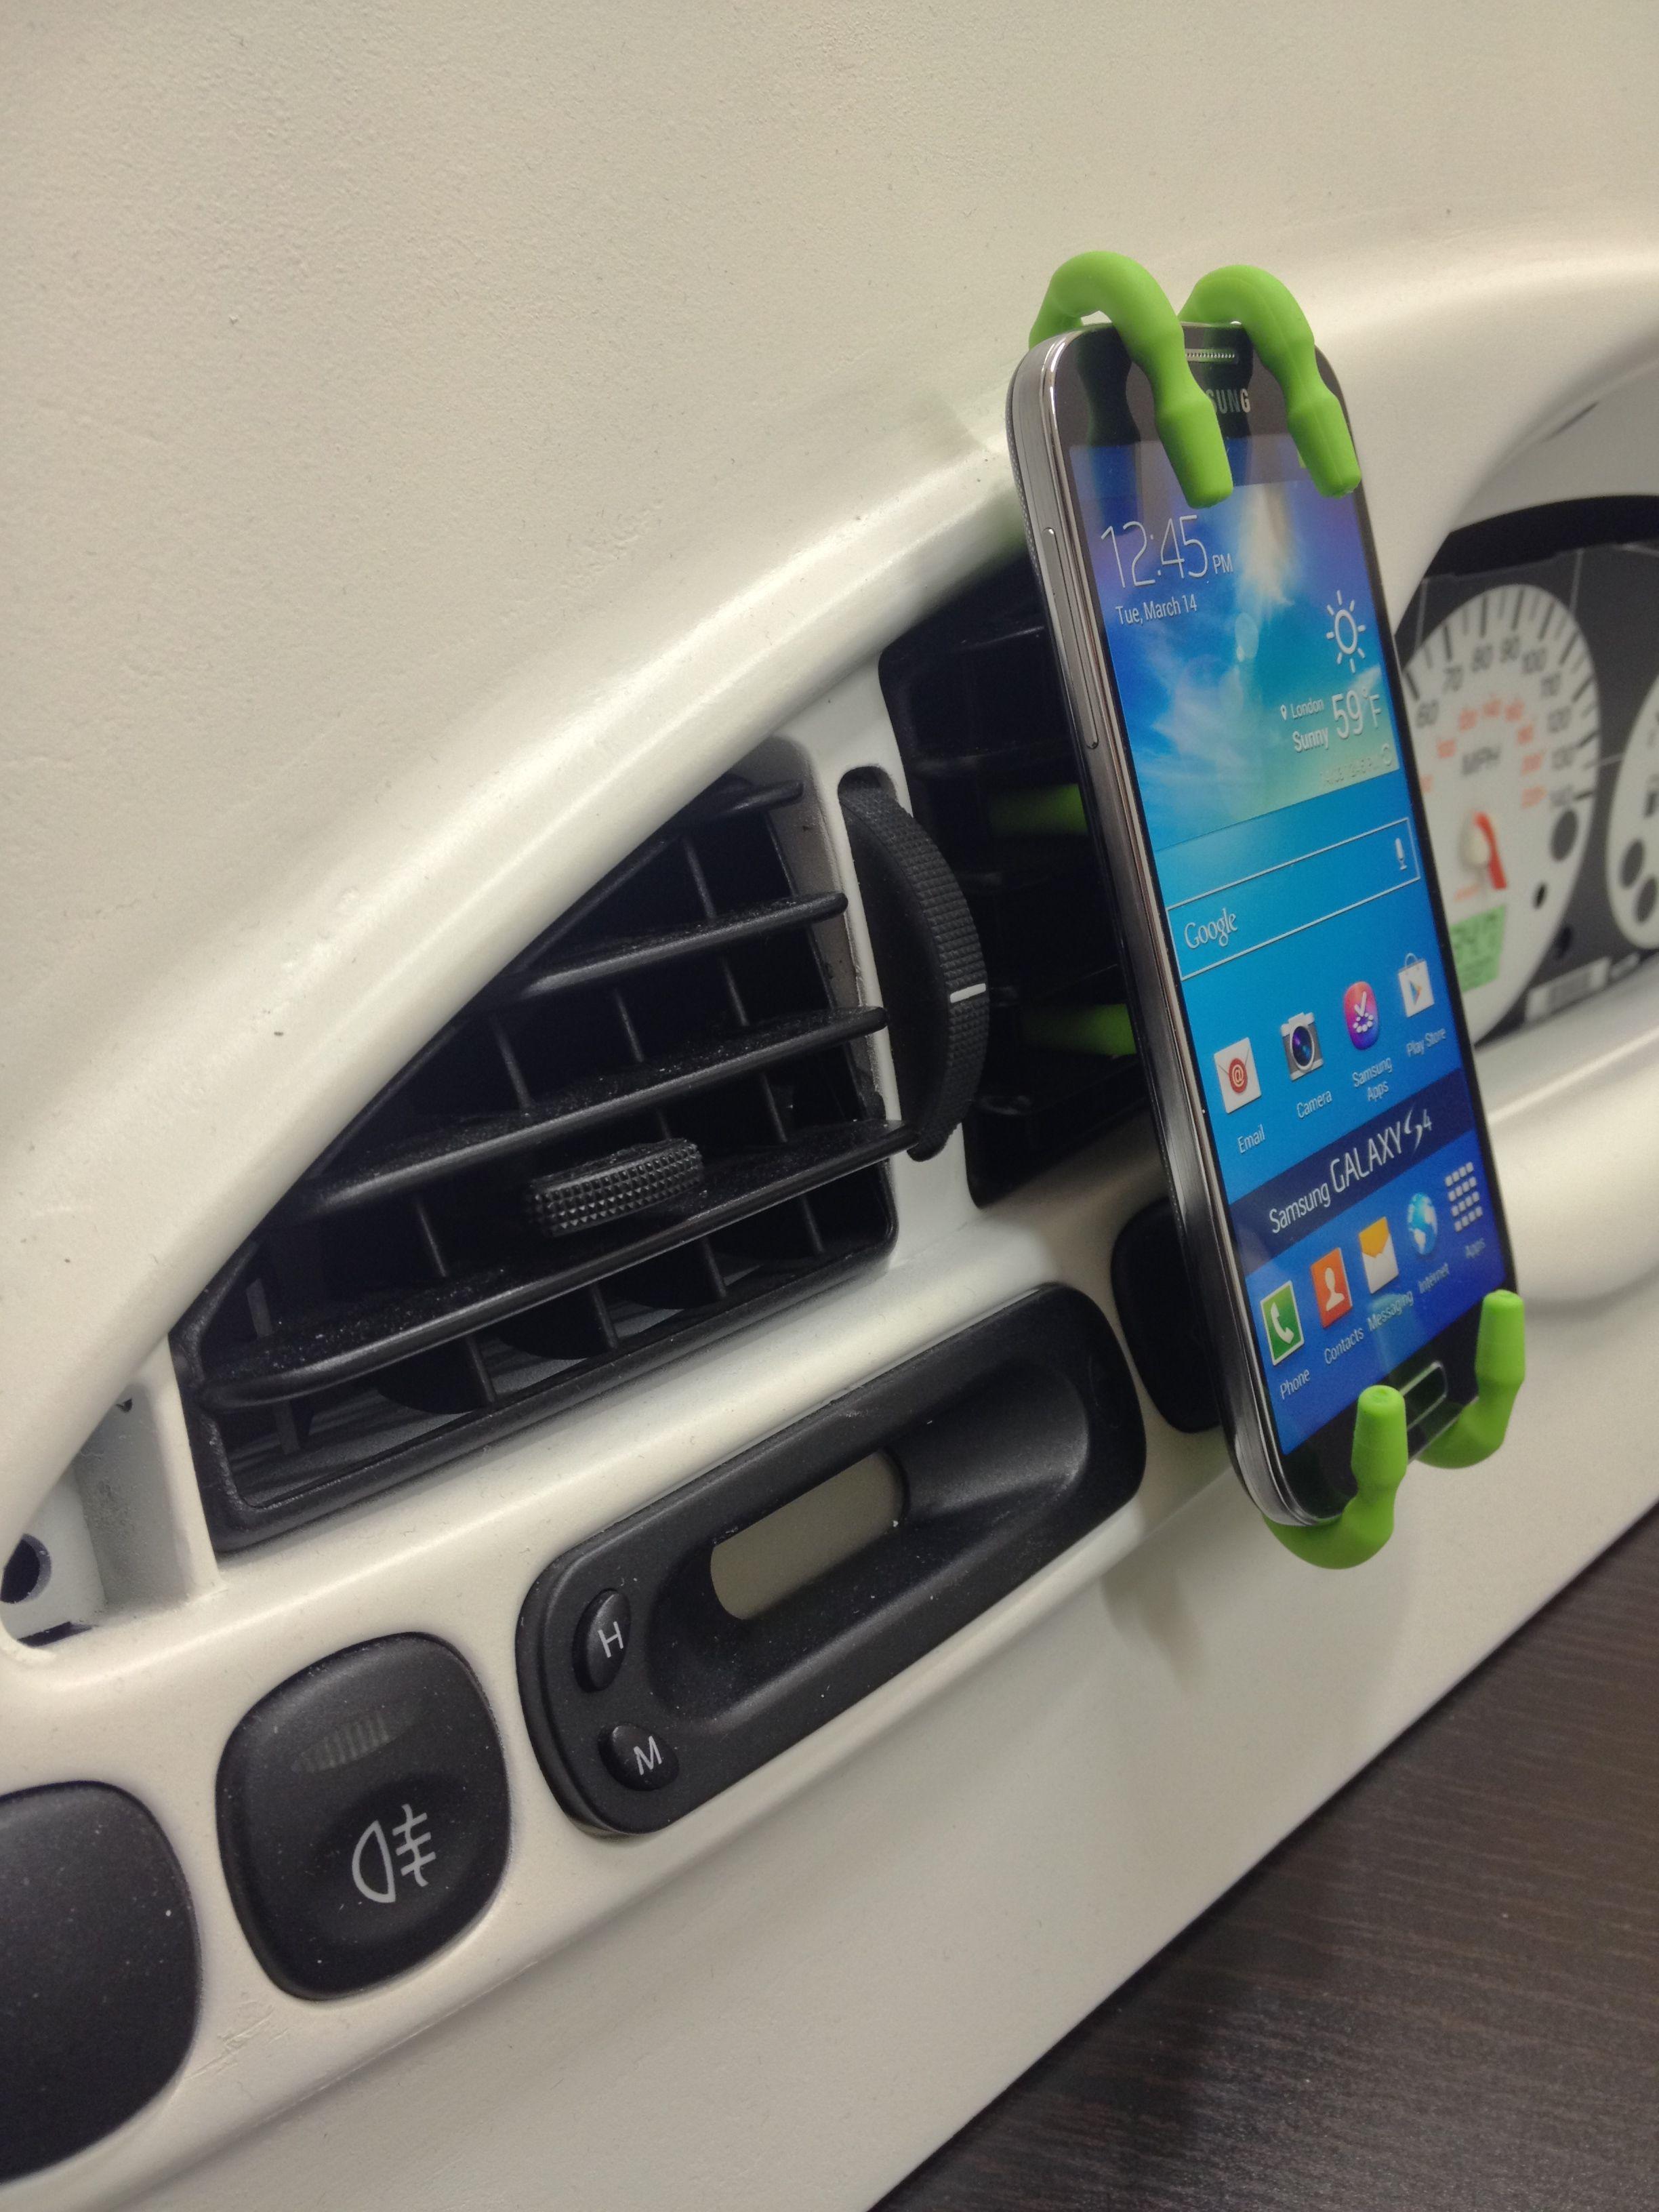 Spiderpodium Cool Tech Gadgets Ipad Repair Latest Gadgets